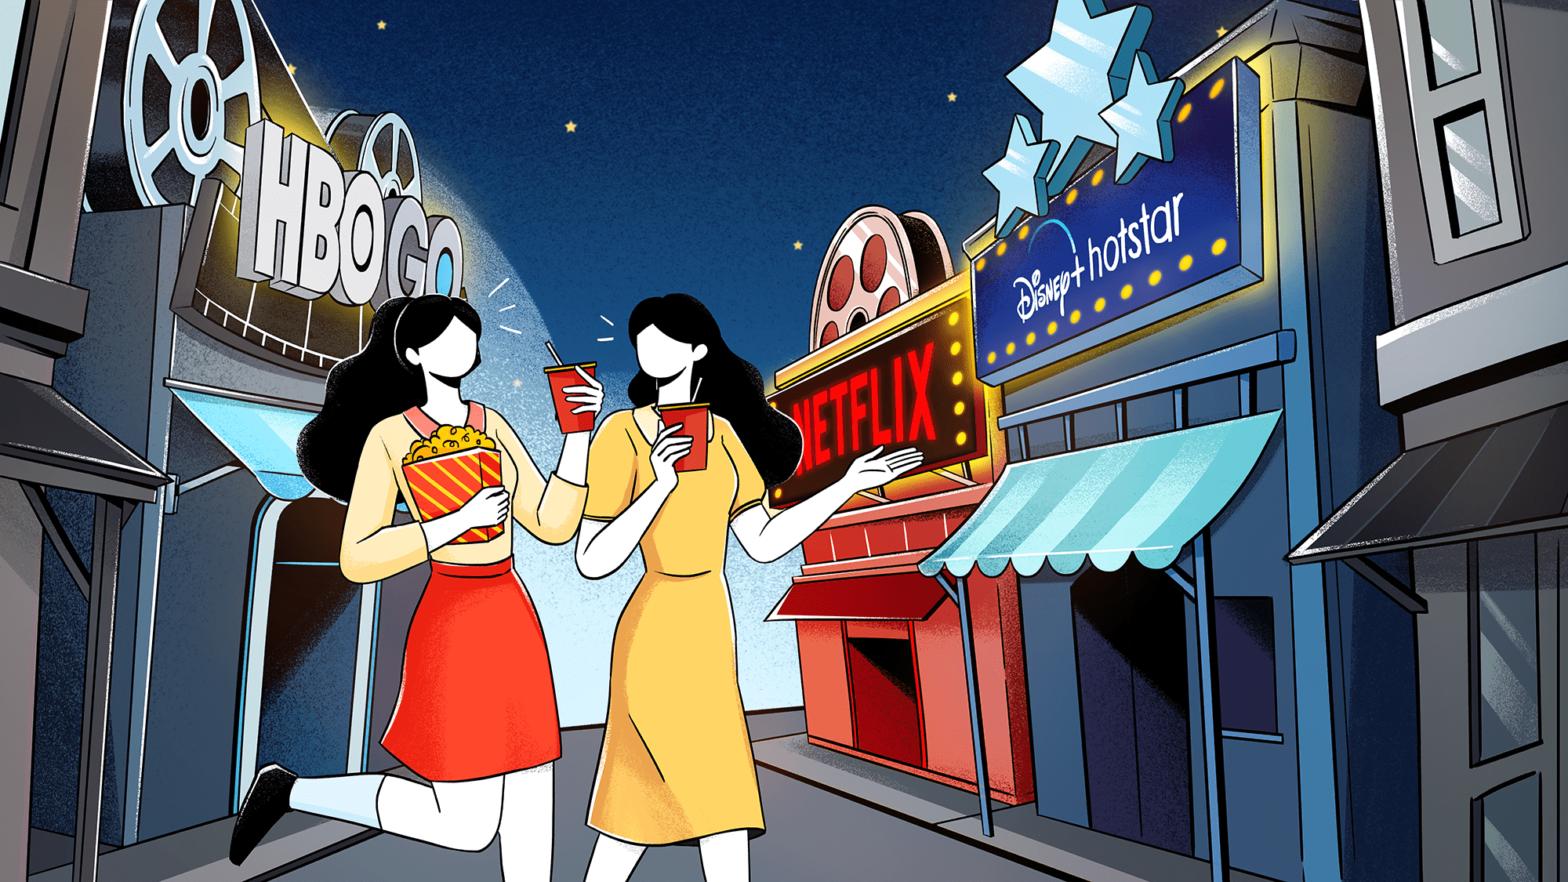 Snappymob UIUX Audit: Netflix, Disney+ Hotstar, HBO GO app comparison